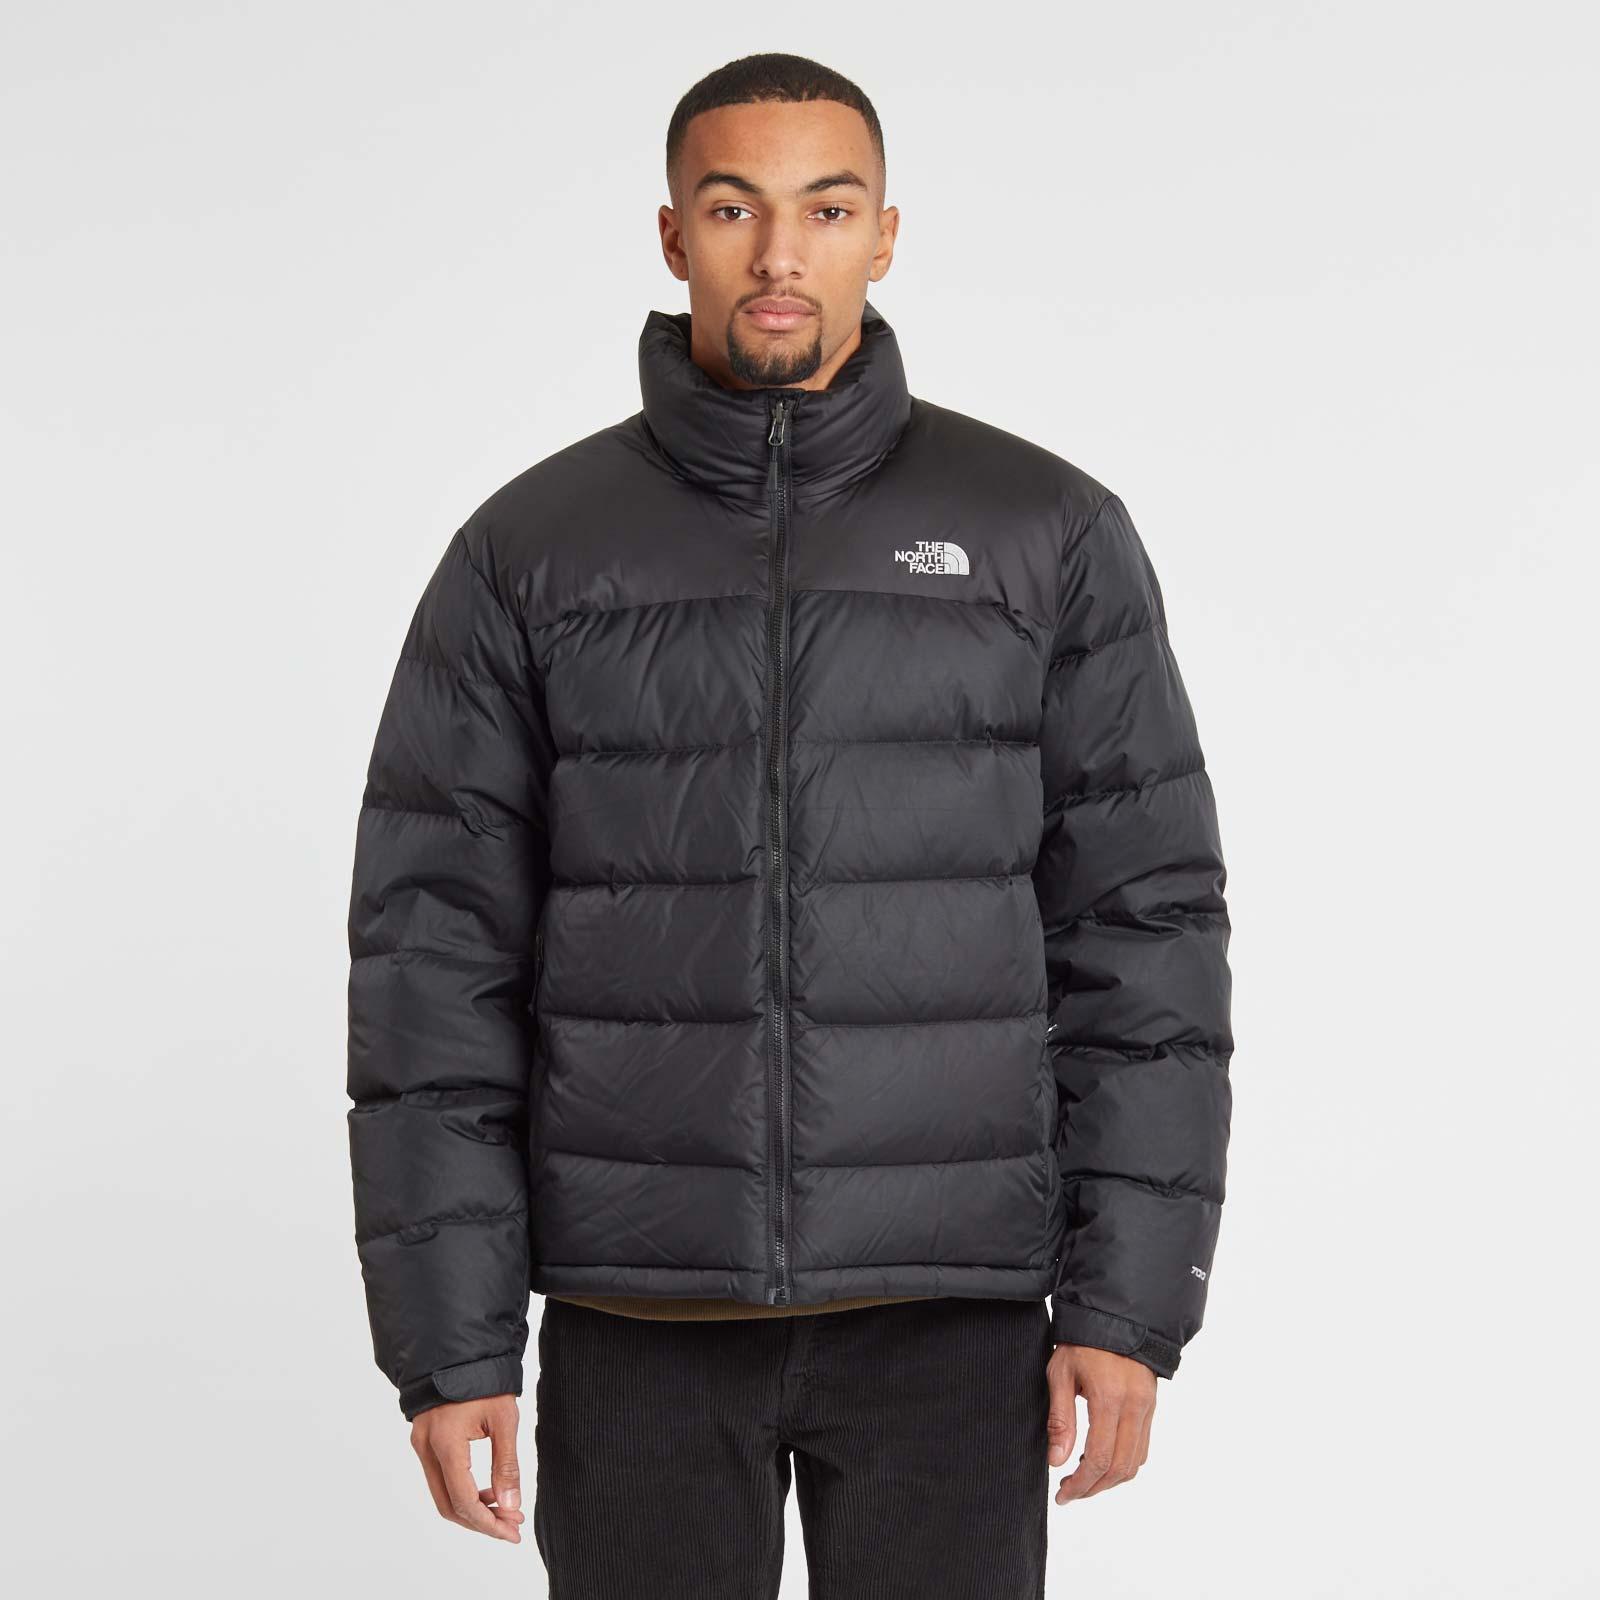 The North Face M Nuptse 2 Jacket - T0aufdc4v - Sneakersnstuff ... e54d6adbd